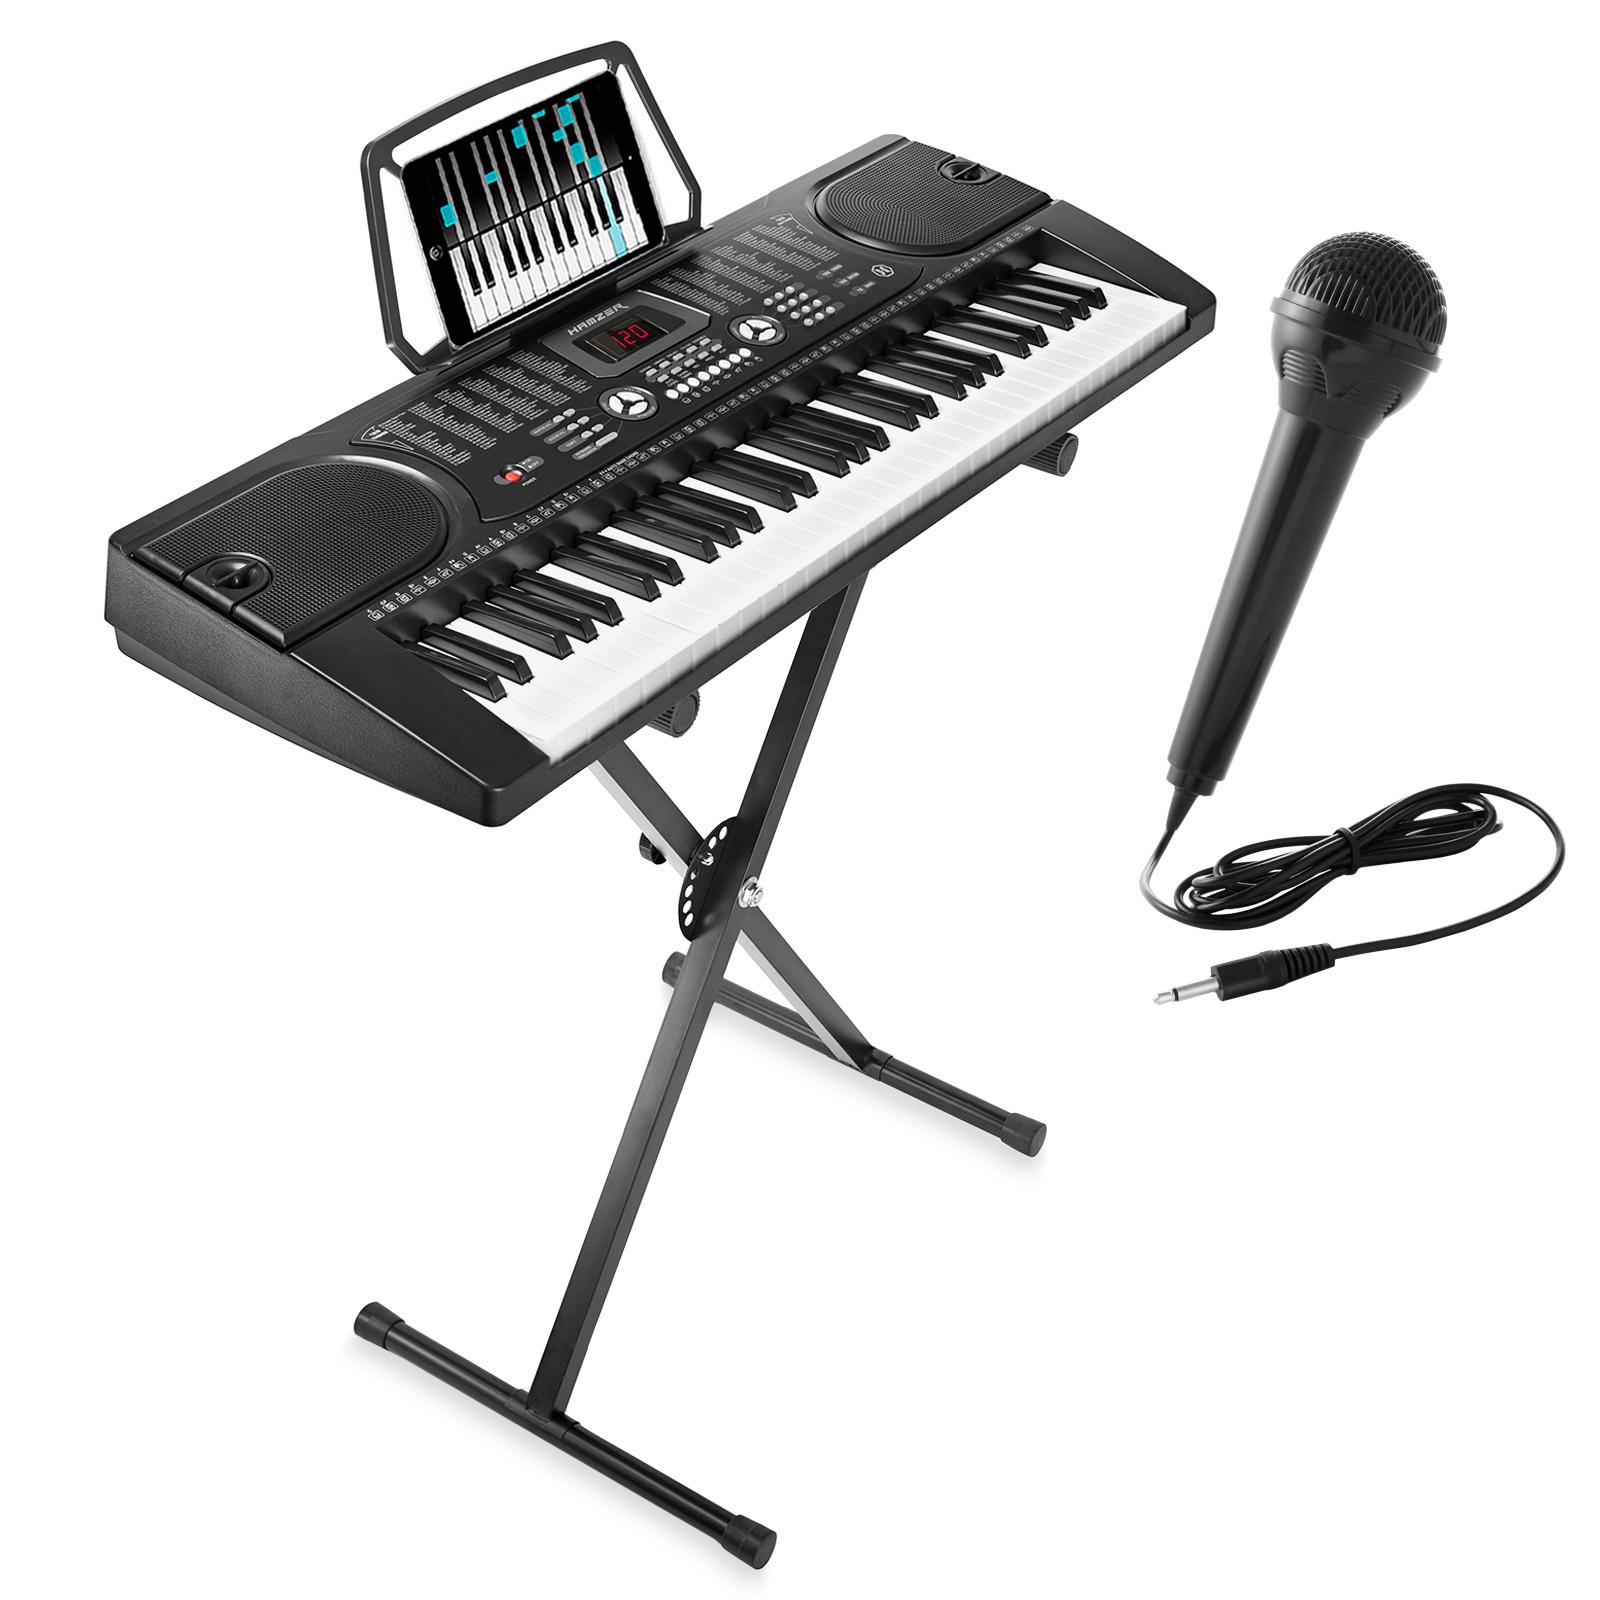 Hamzer 61-Key Electronic Piano Electric Organ Music Keyboard with Stand - Black